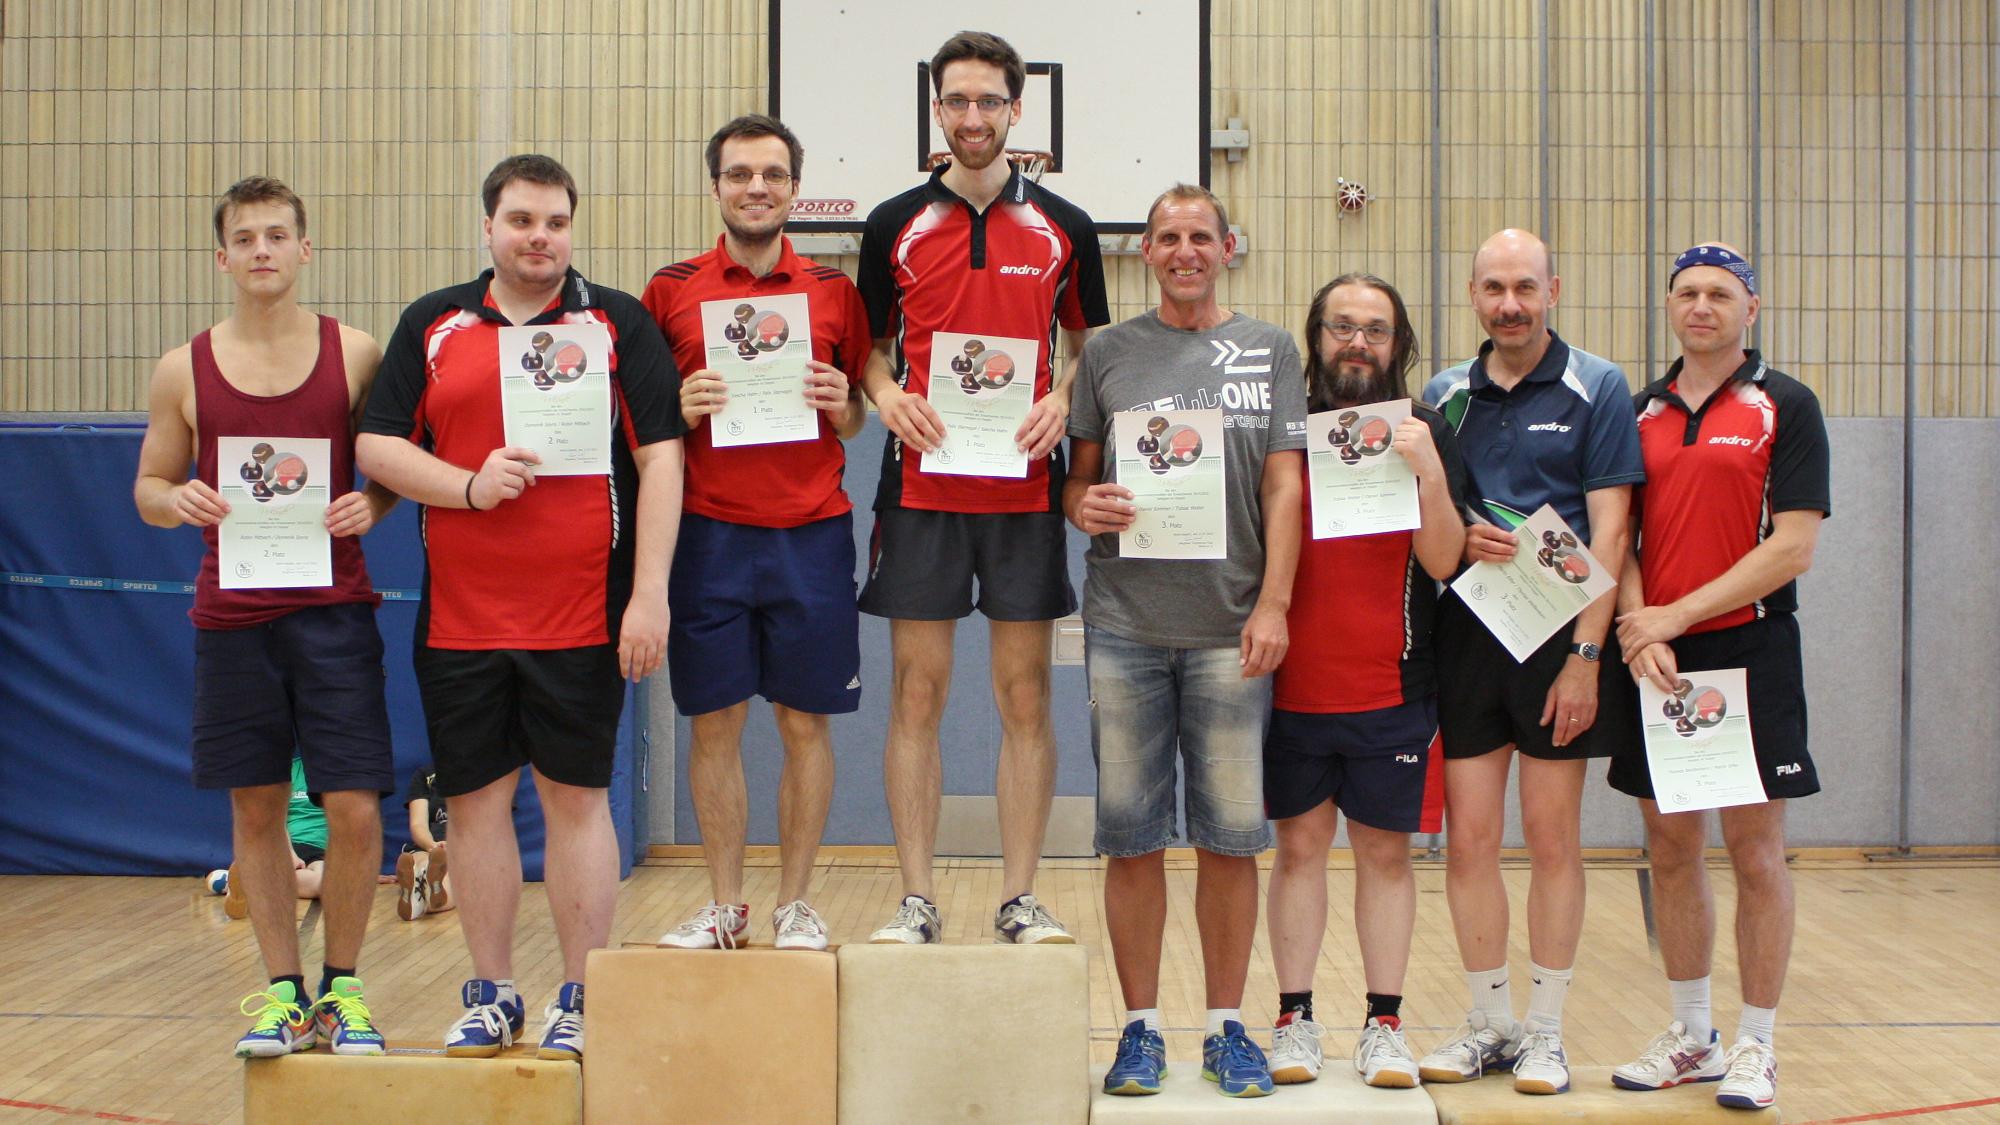 1. Platz Sascha/Felix; 2. Platz Robin/Domenik; 3. Platz Daniel/Tobias und Martin E./Thomas W.